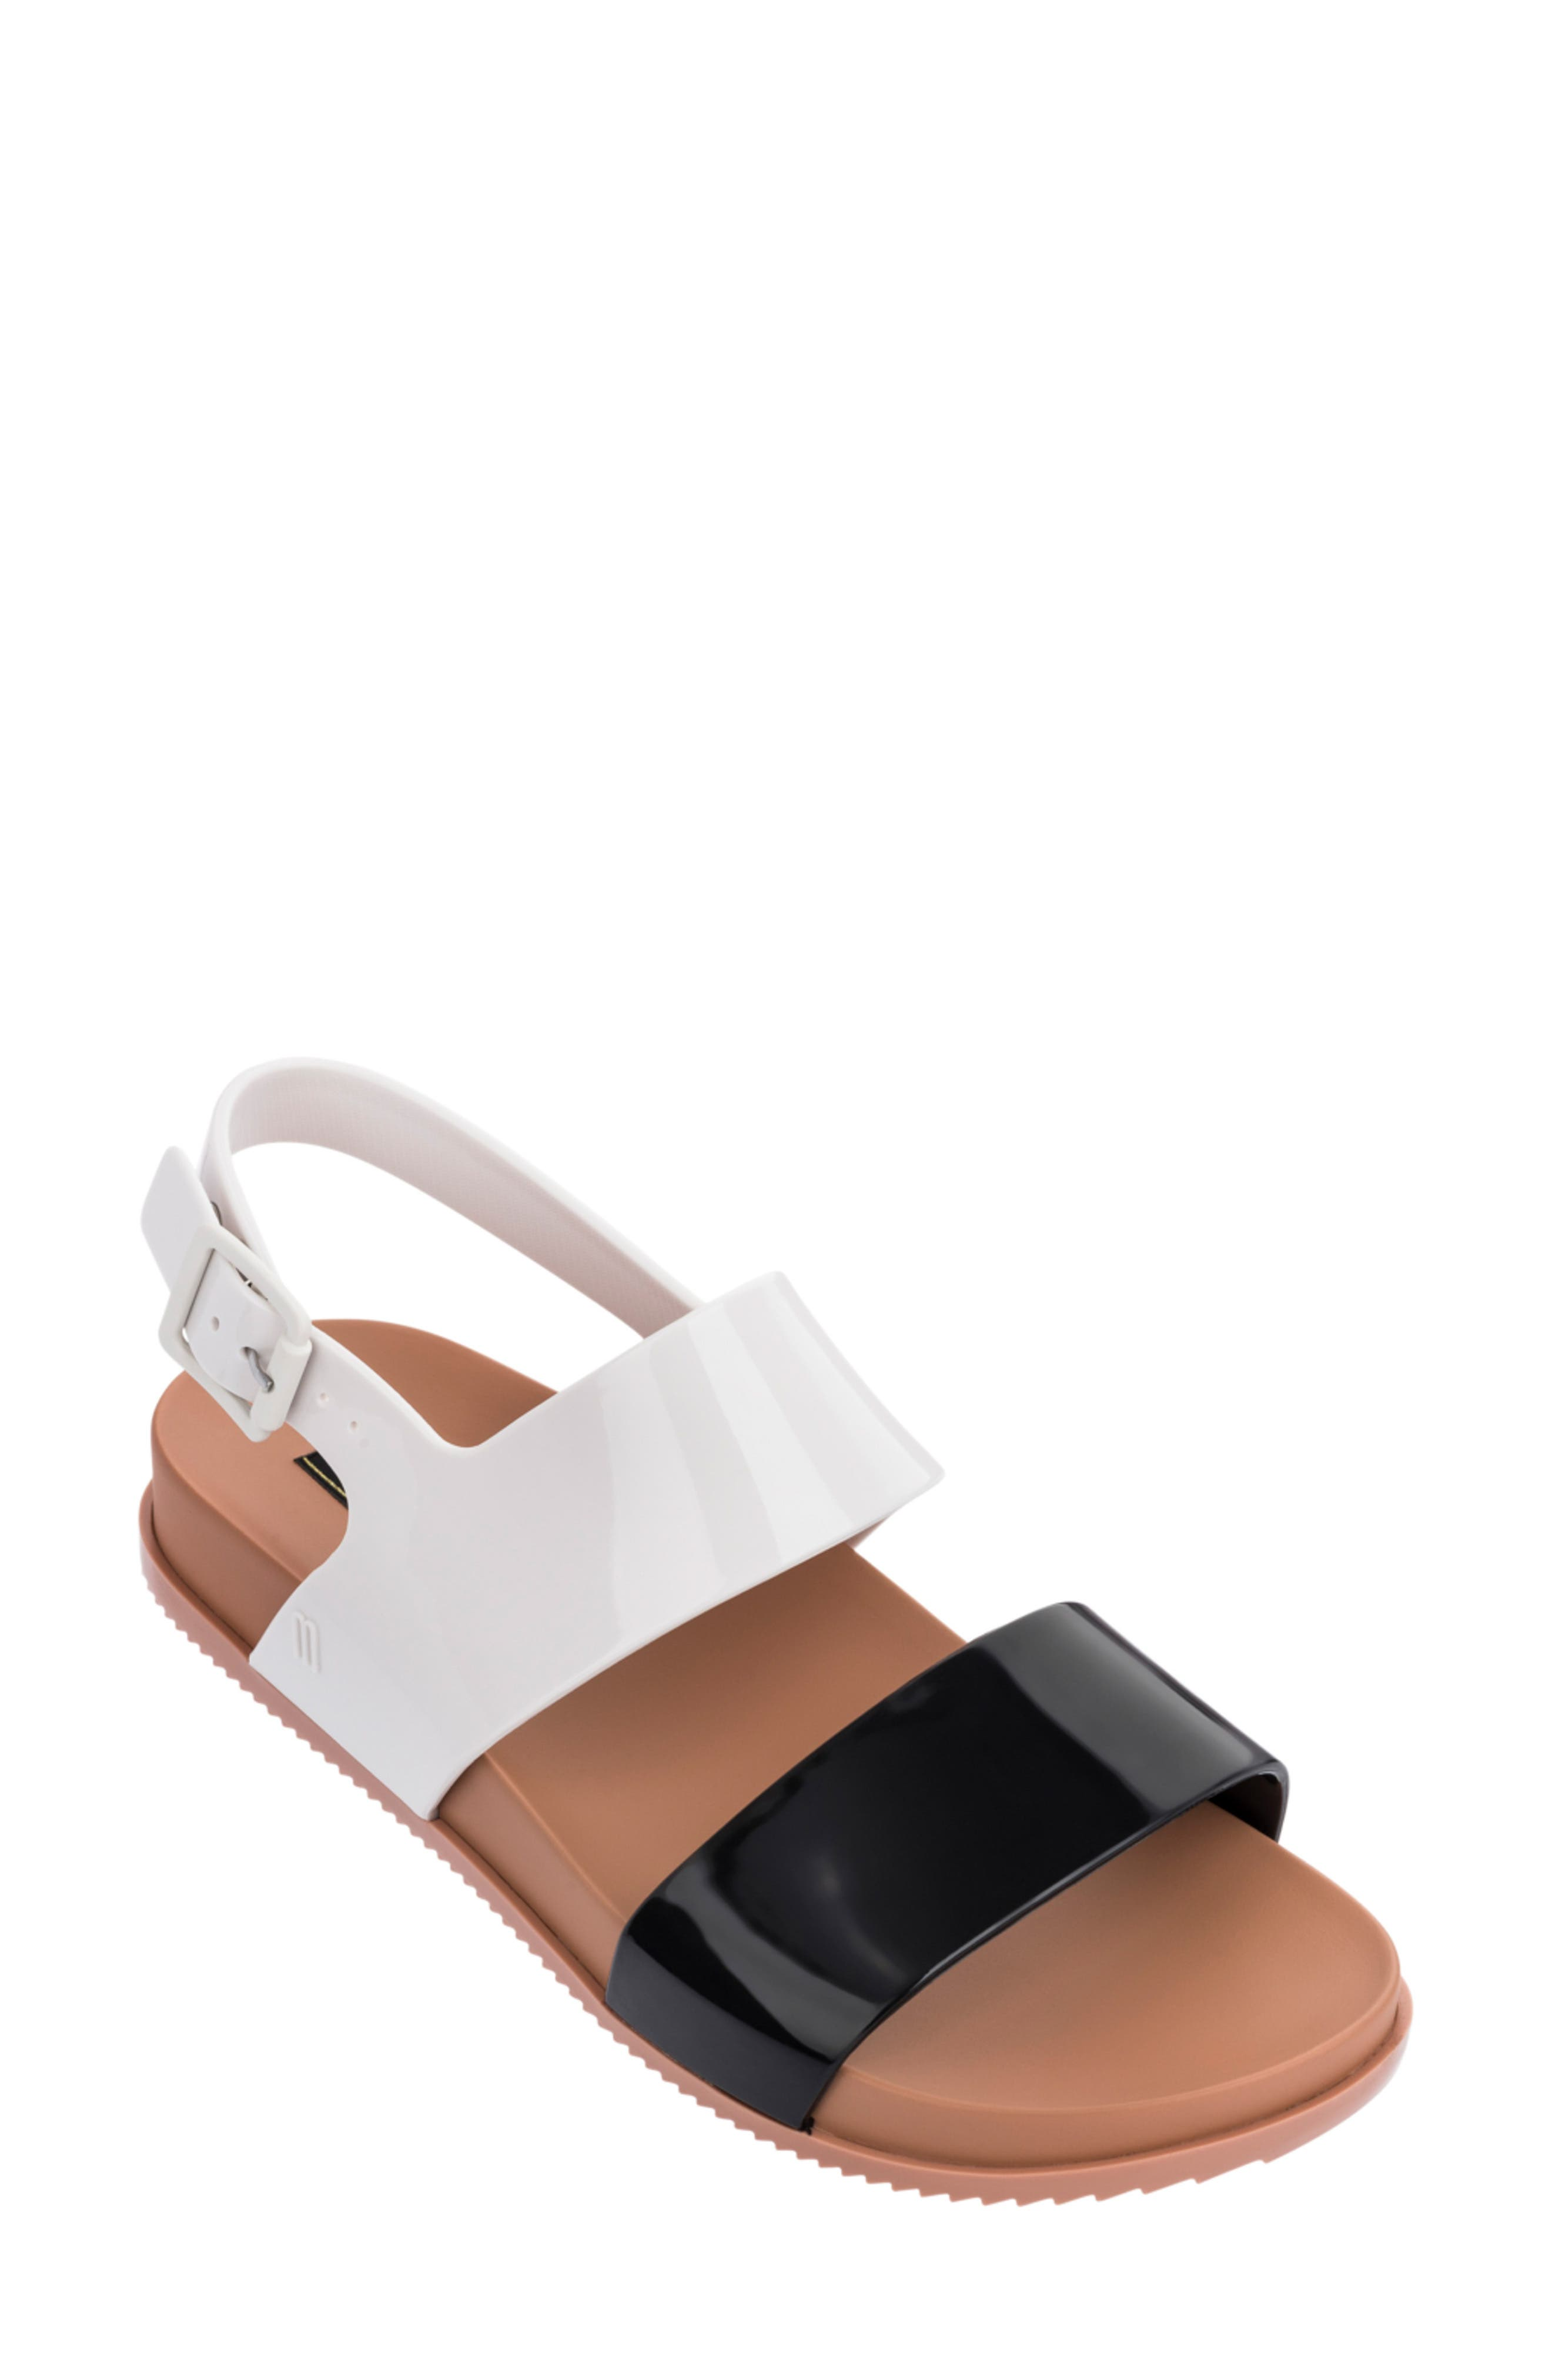 Melissa Slippers Cosmic III Sandal